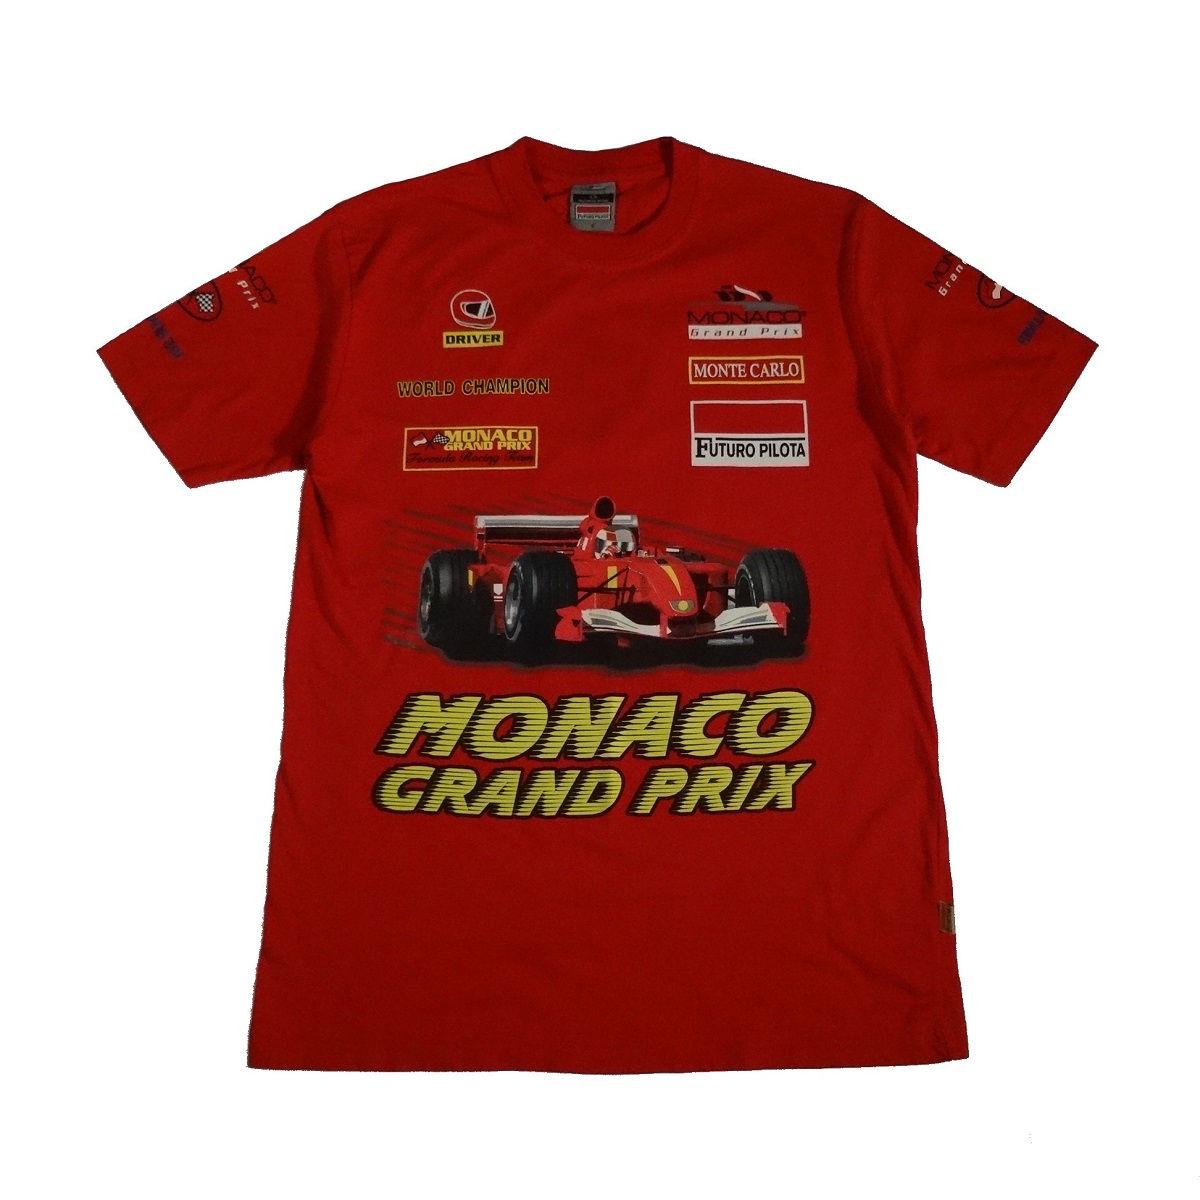 monaco grand prix racing futuro pilota t shirt front